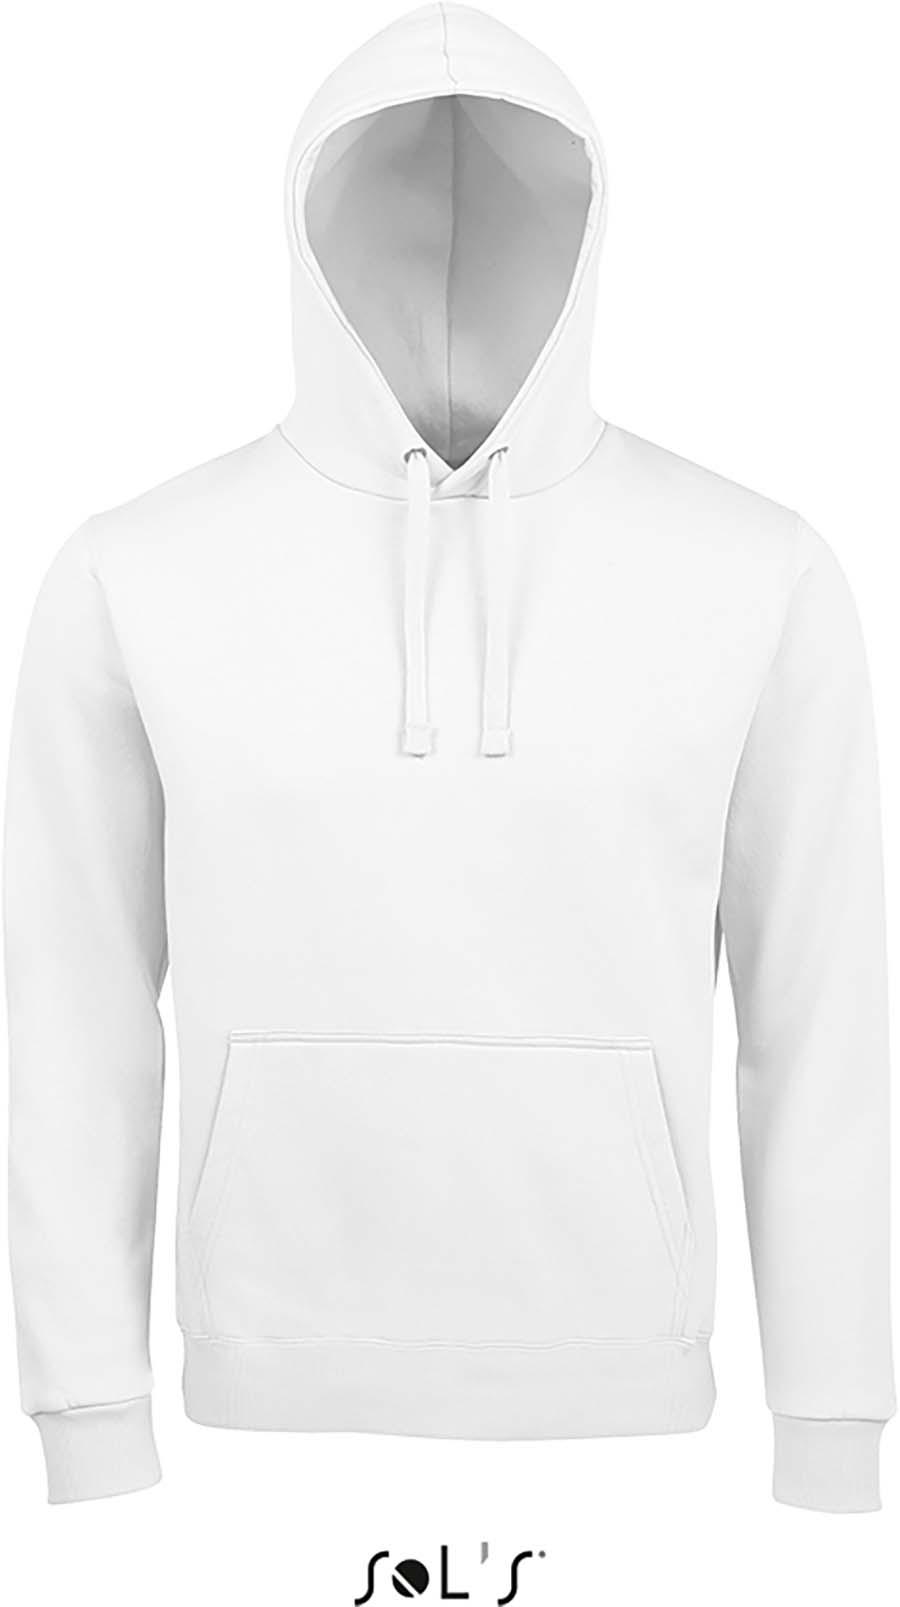 Sweat-shirt unisexe à capuche - 1-1403-2